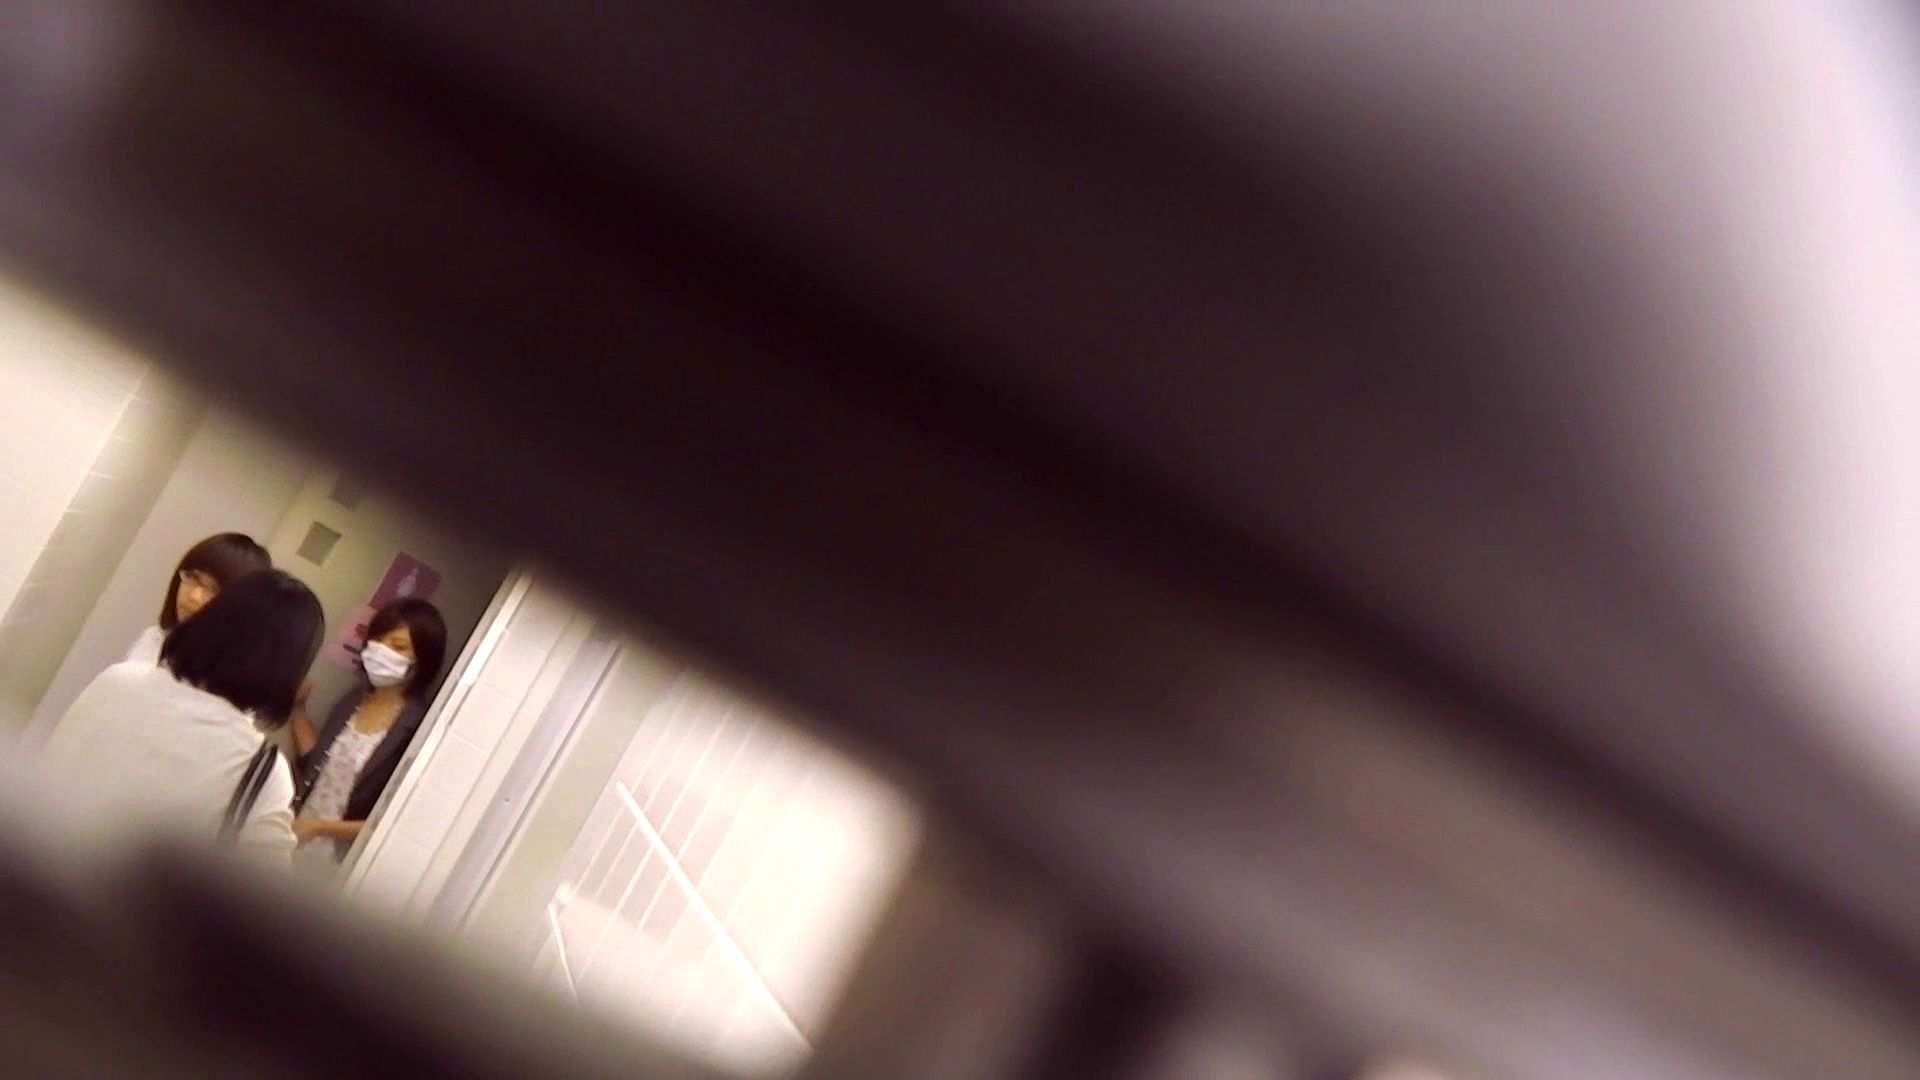 vol.16 命がけ潜伏洗面所! 美女たっぷり!! プライベート オマンコ無修正動画無料 90連発 54